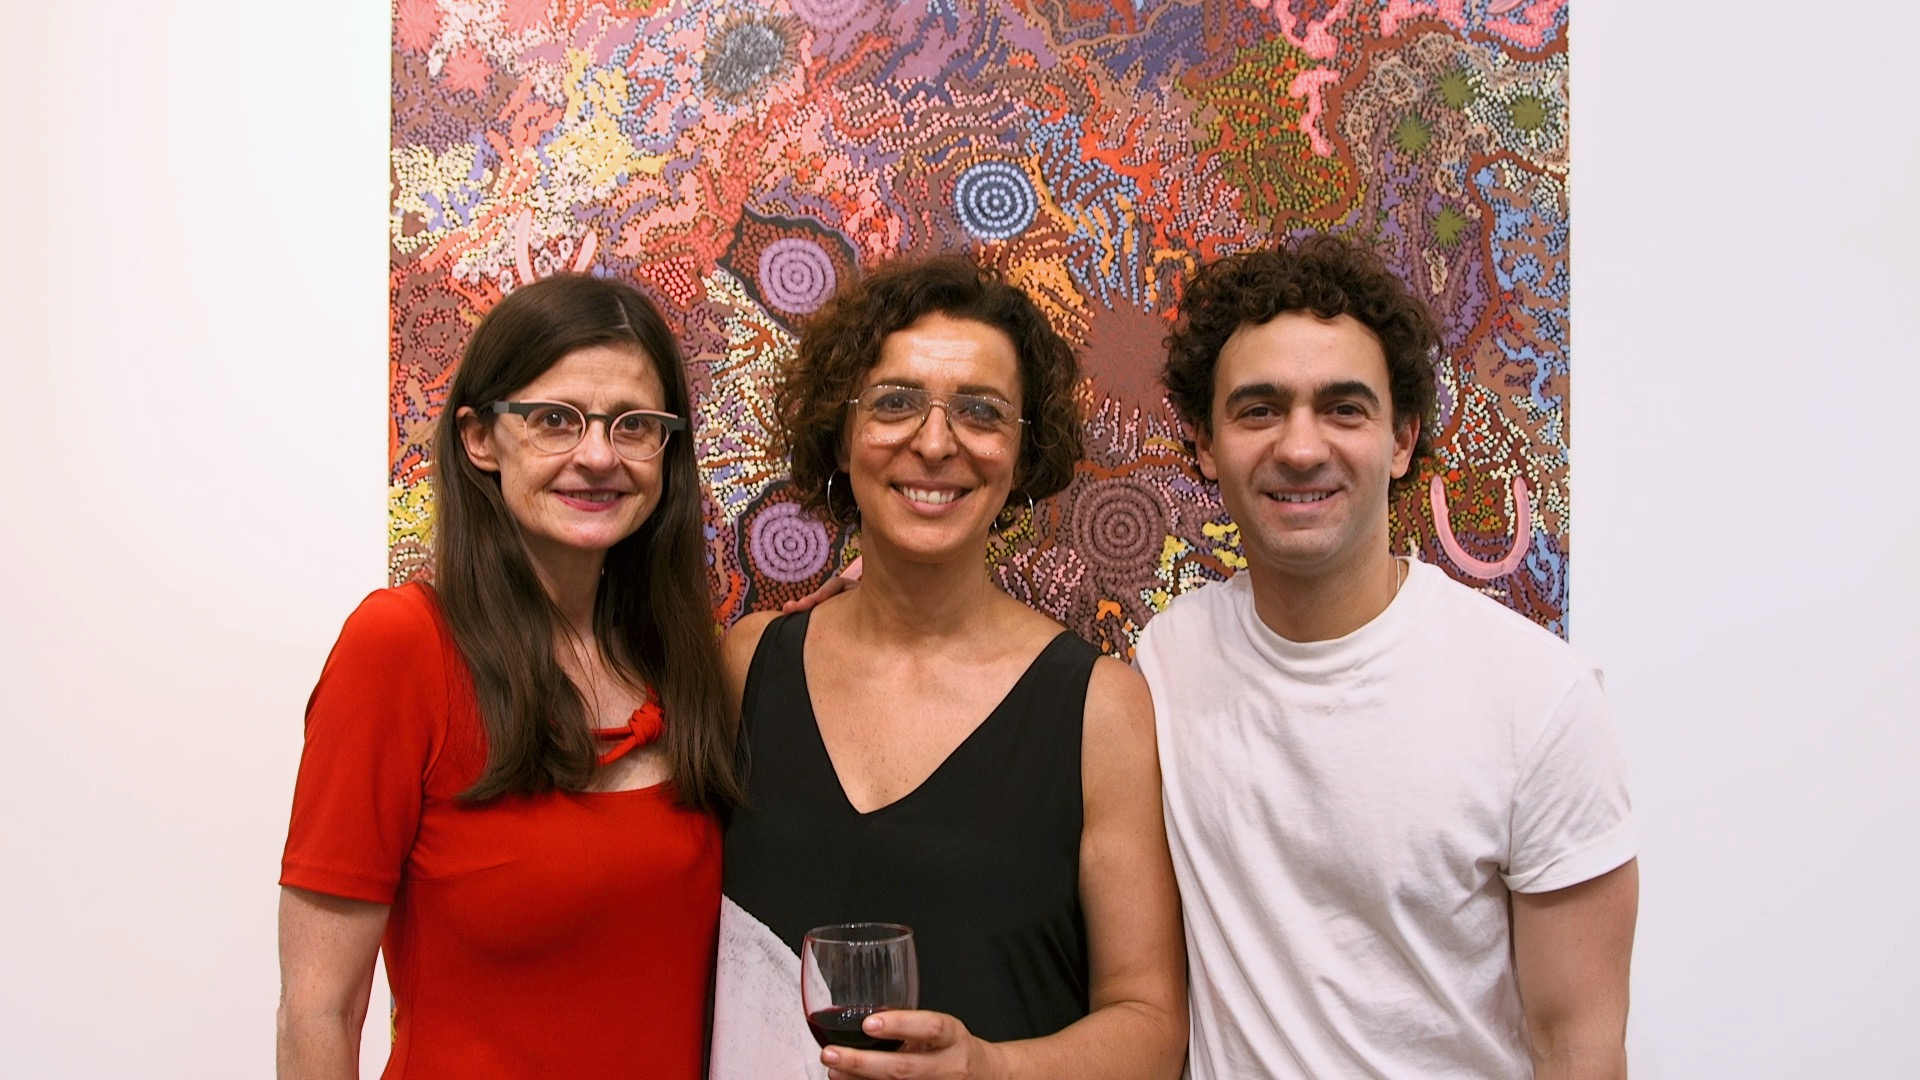 Belinda Luscombe, Serafina Maiorano and Jeremy Heimans